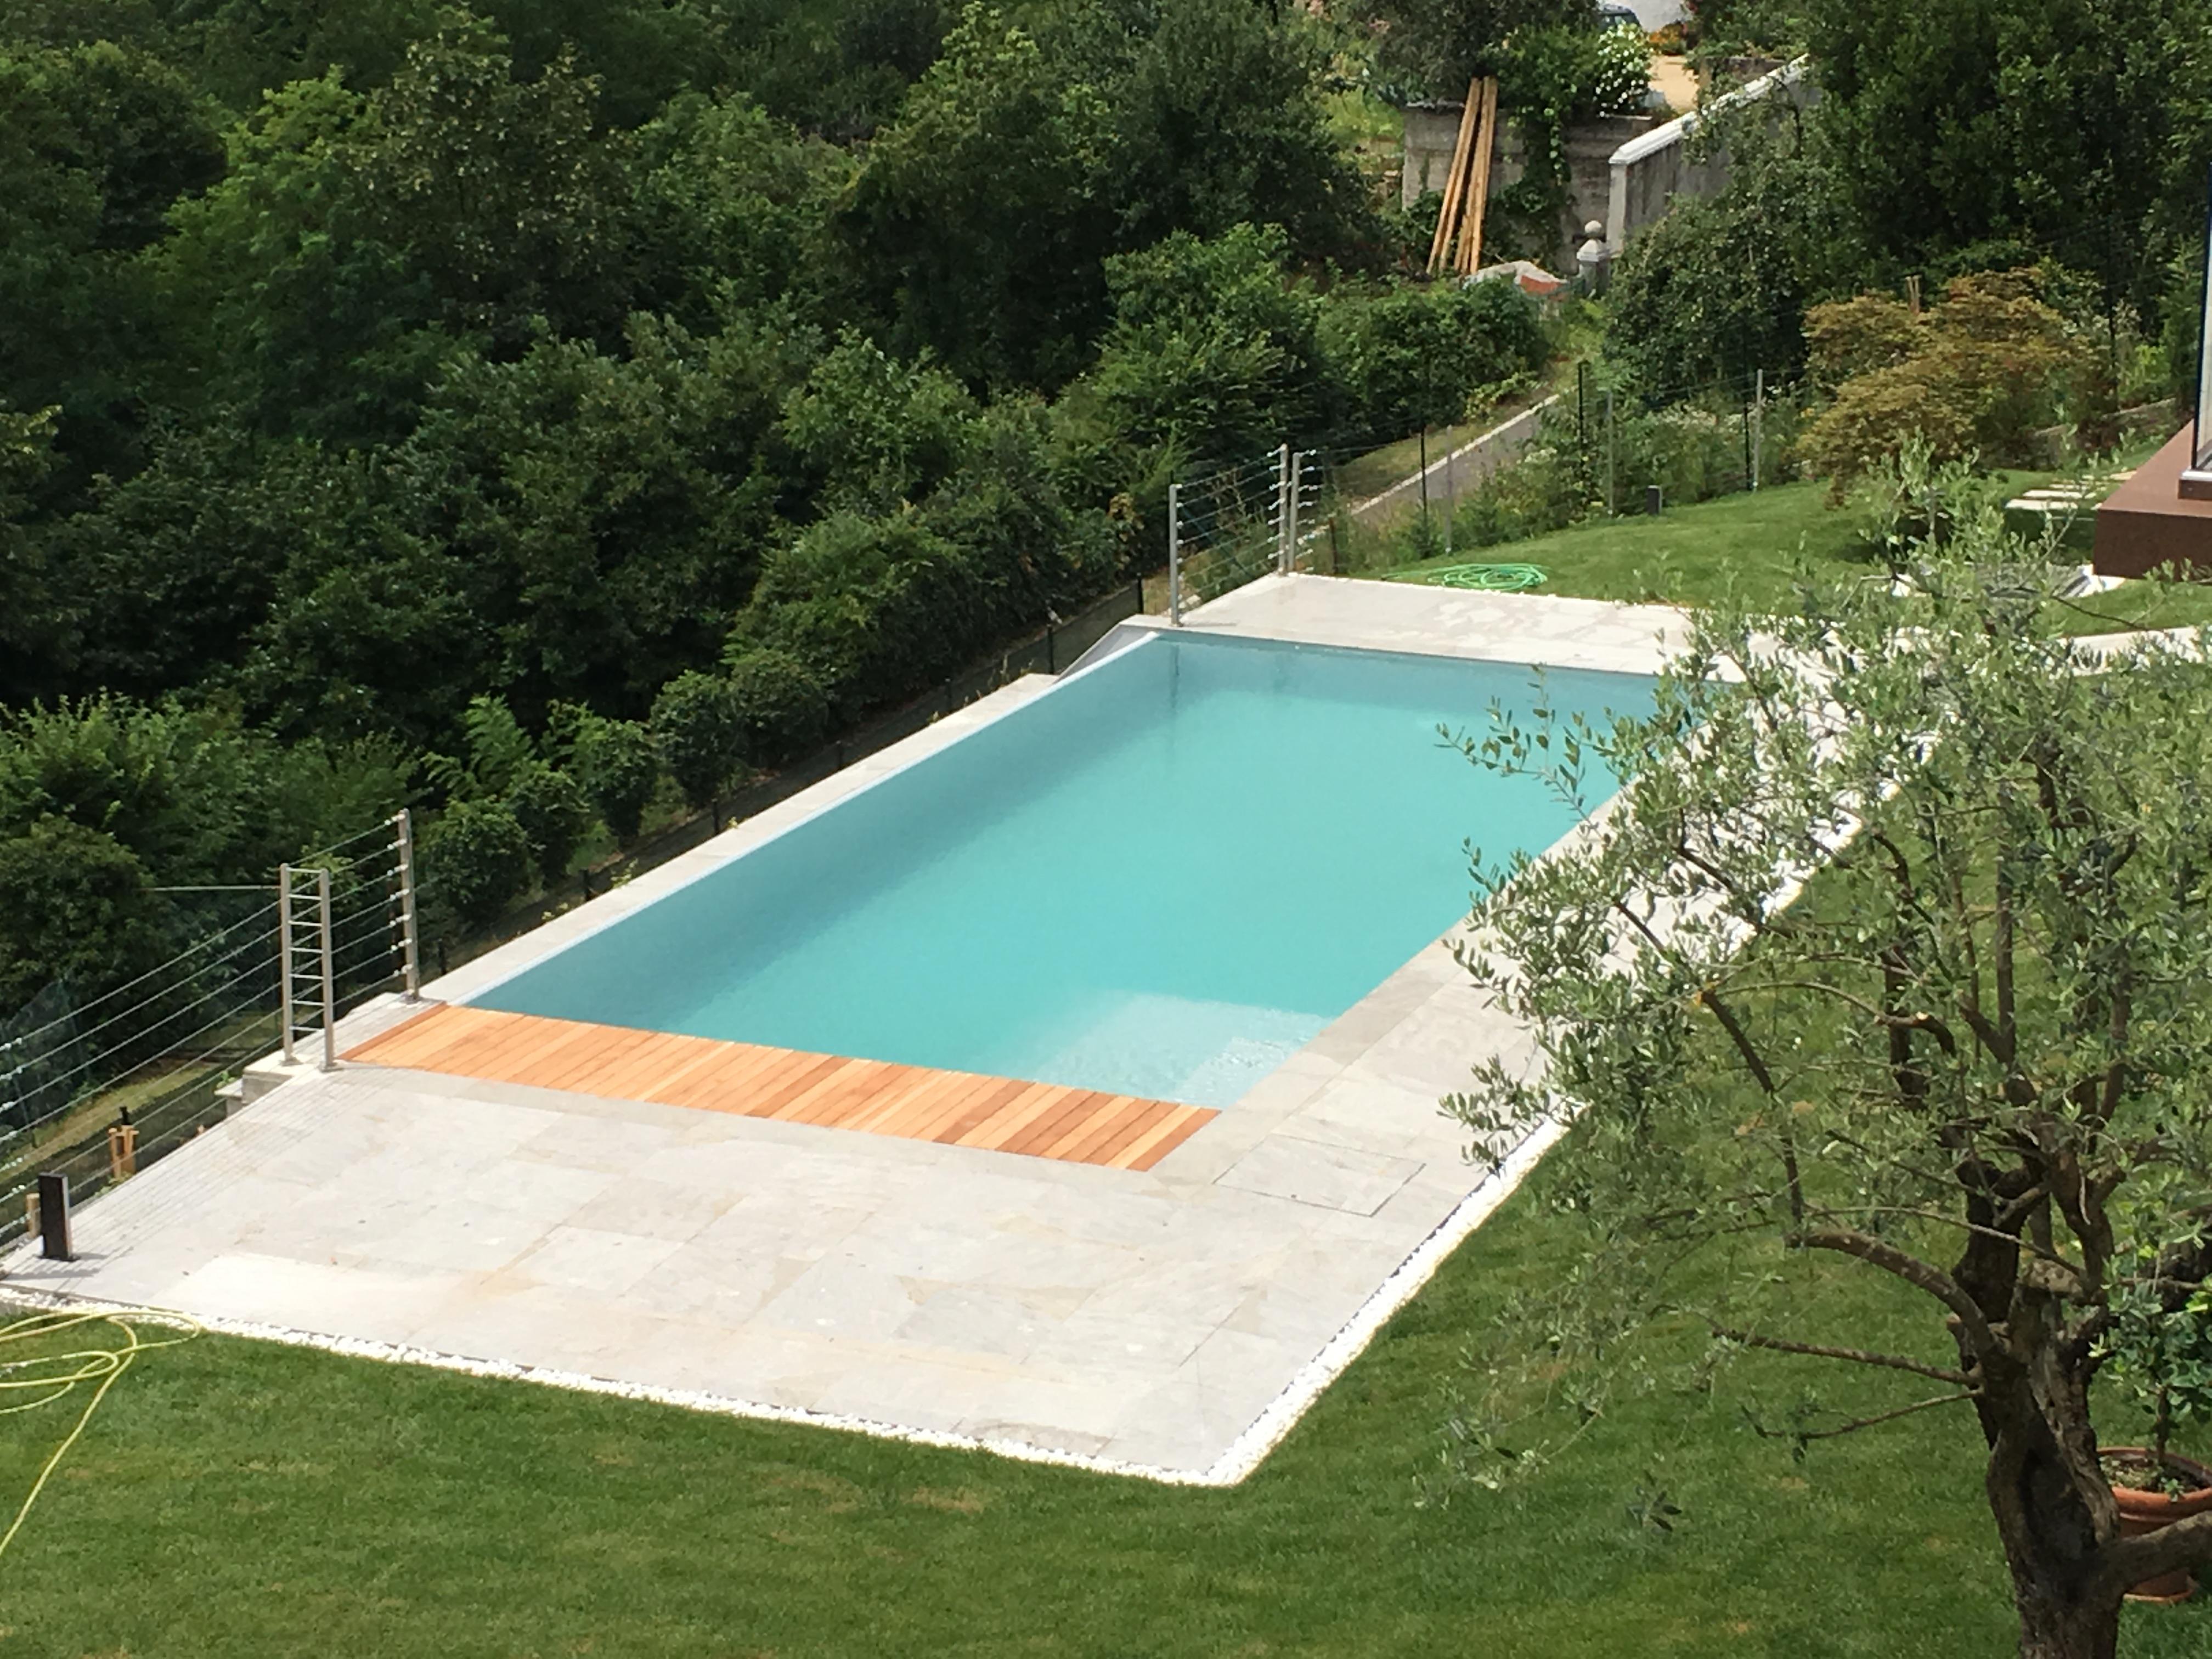 Piscine Sfioro A Cascata piscina a sfioro con cascata infinity - aepiscine